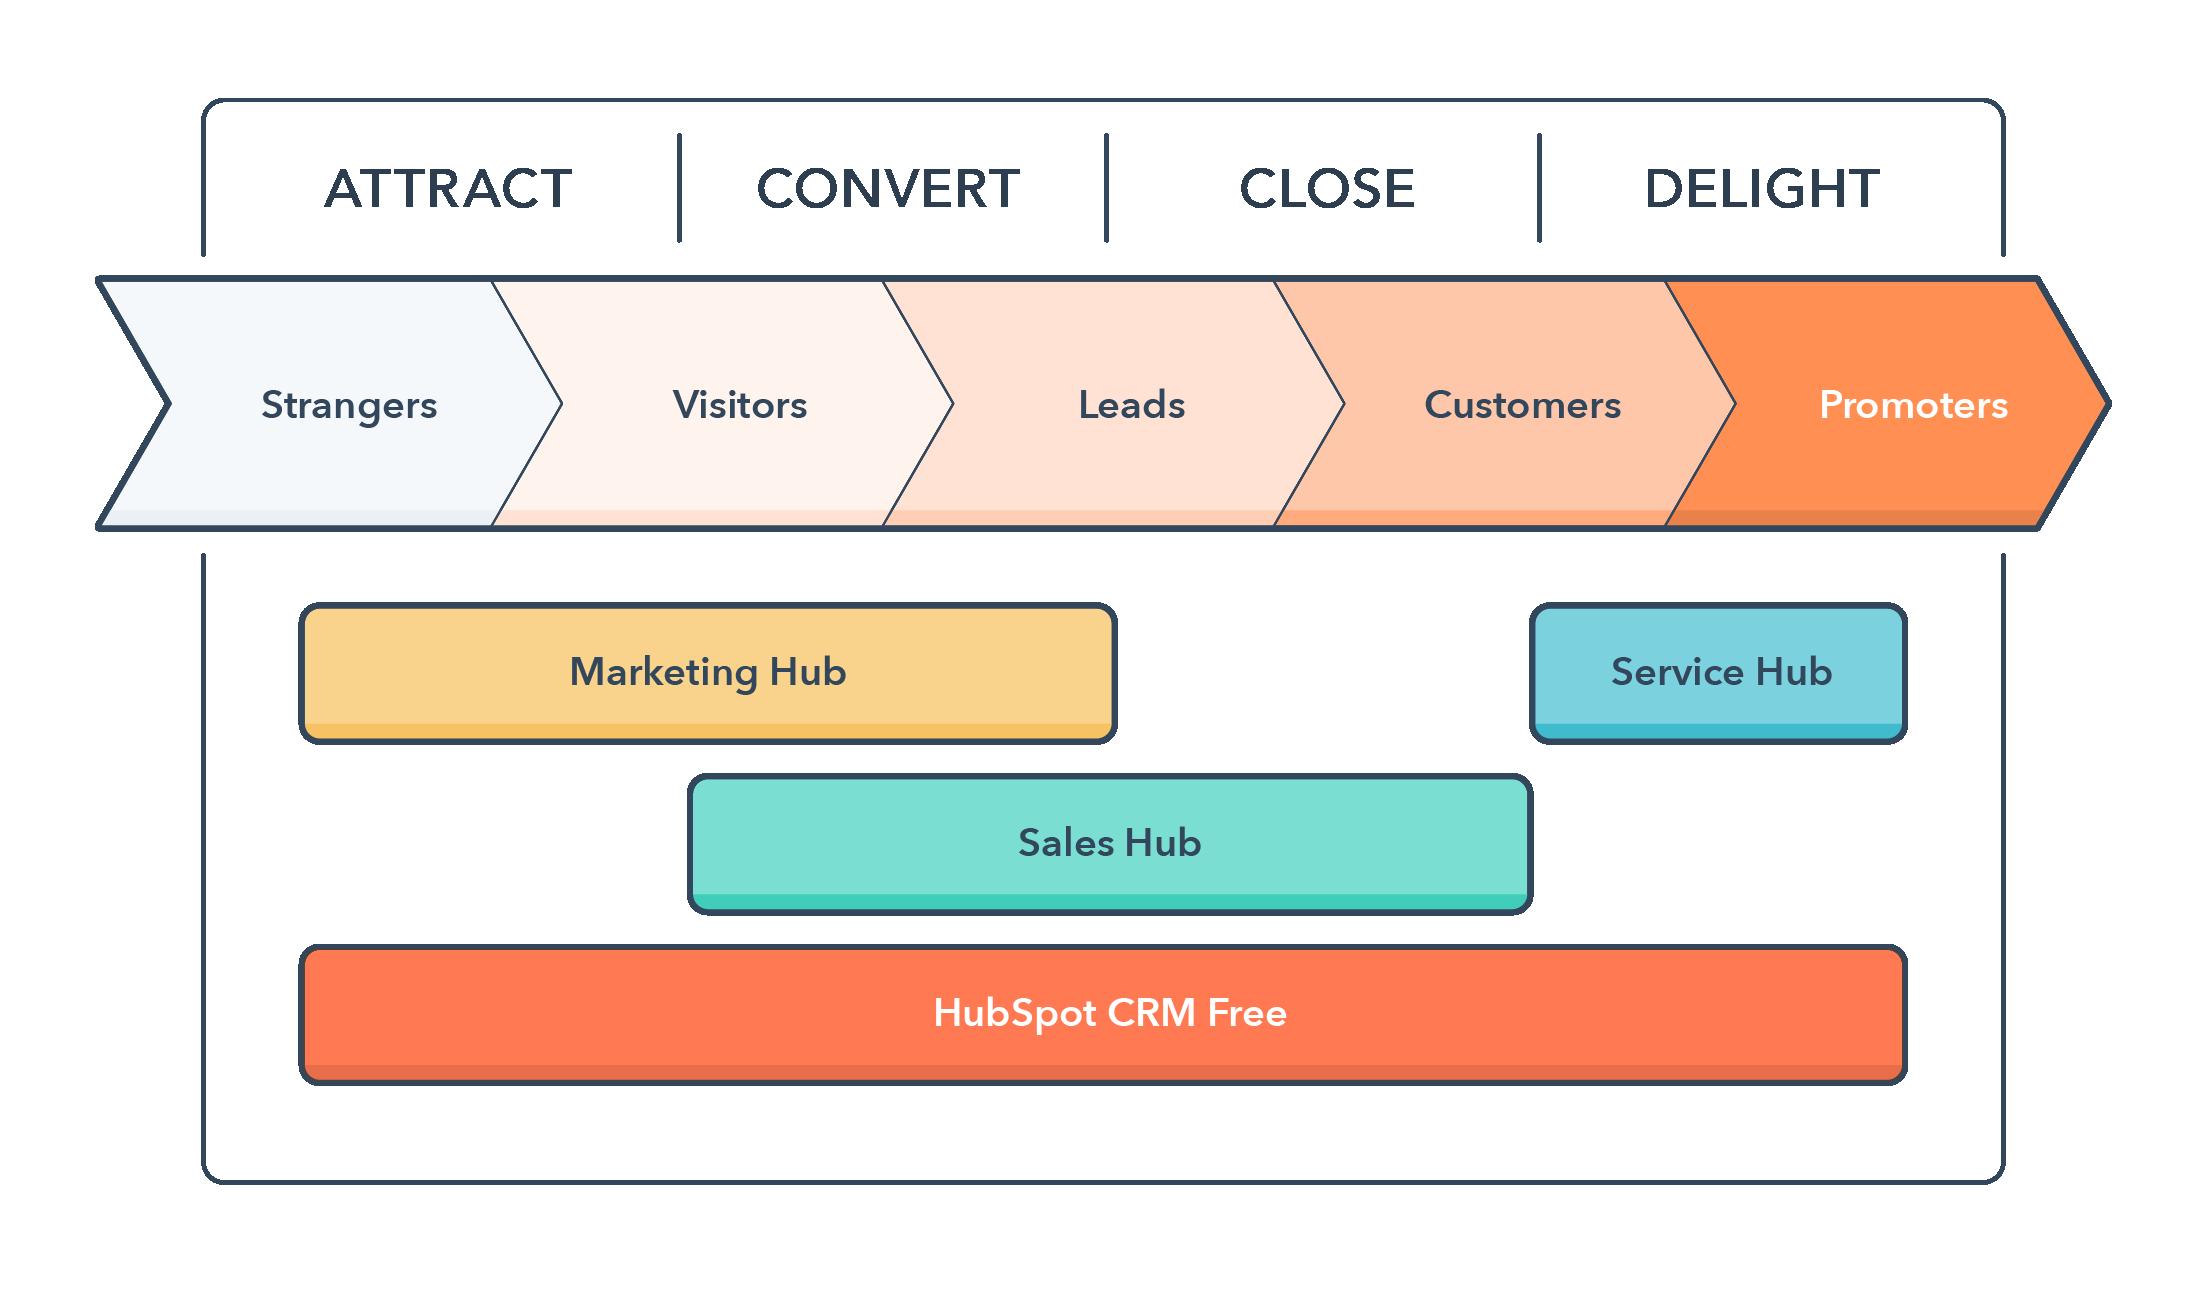 Service Hub added to inbound methodology